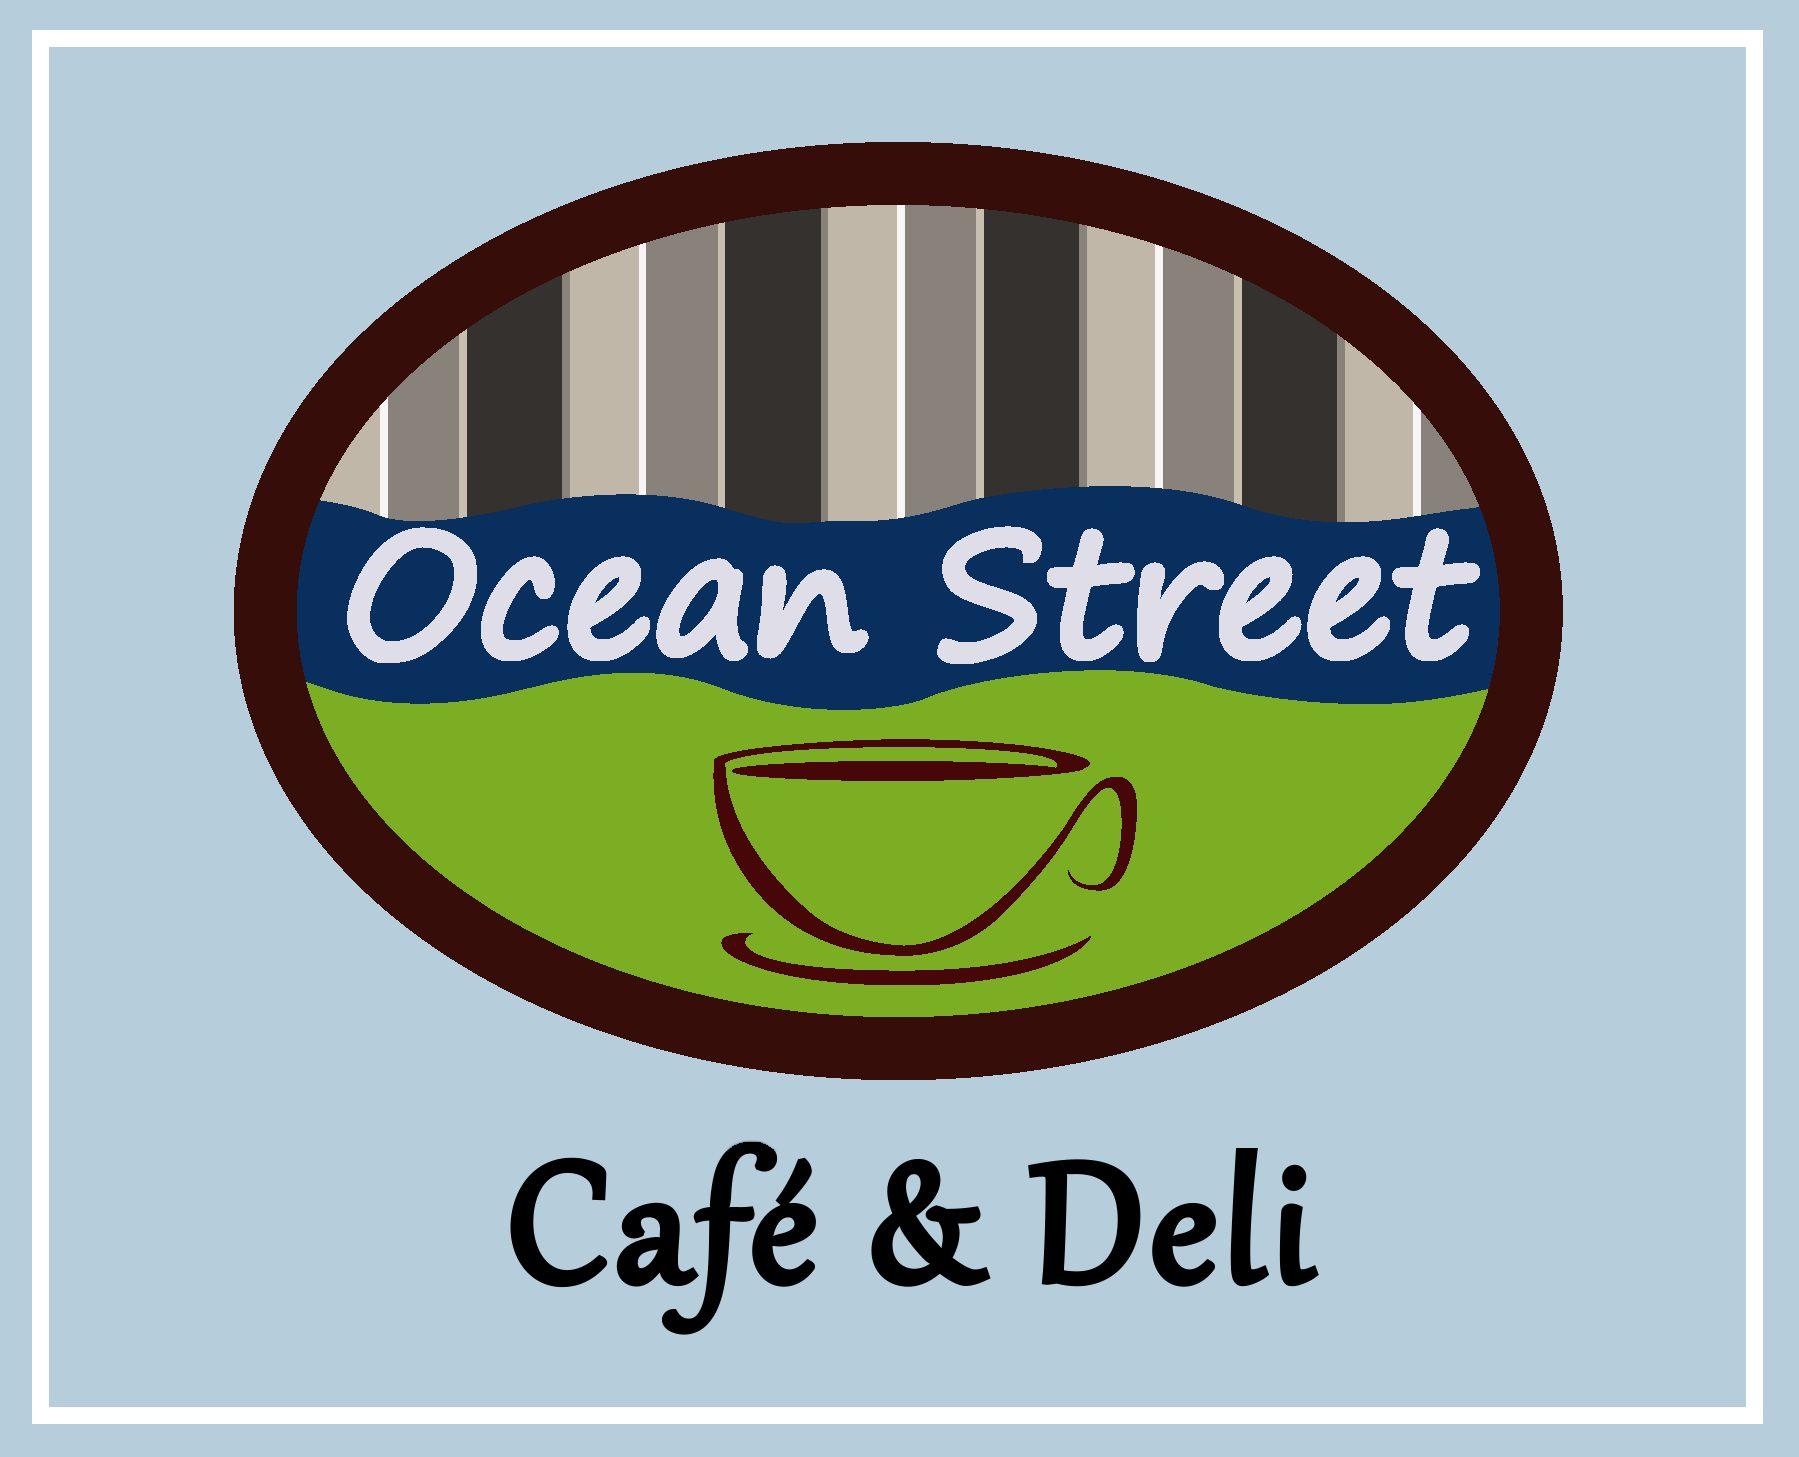 Ocean Street Cafe + Deli